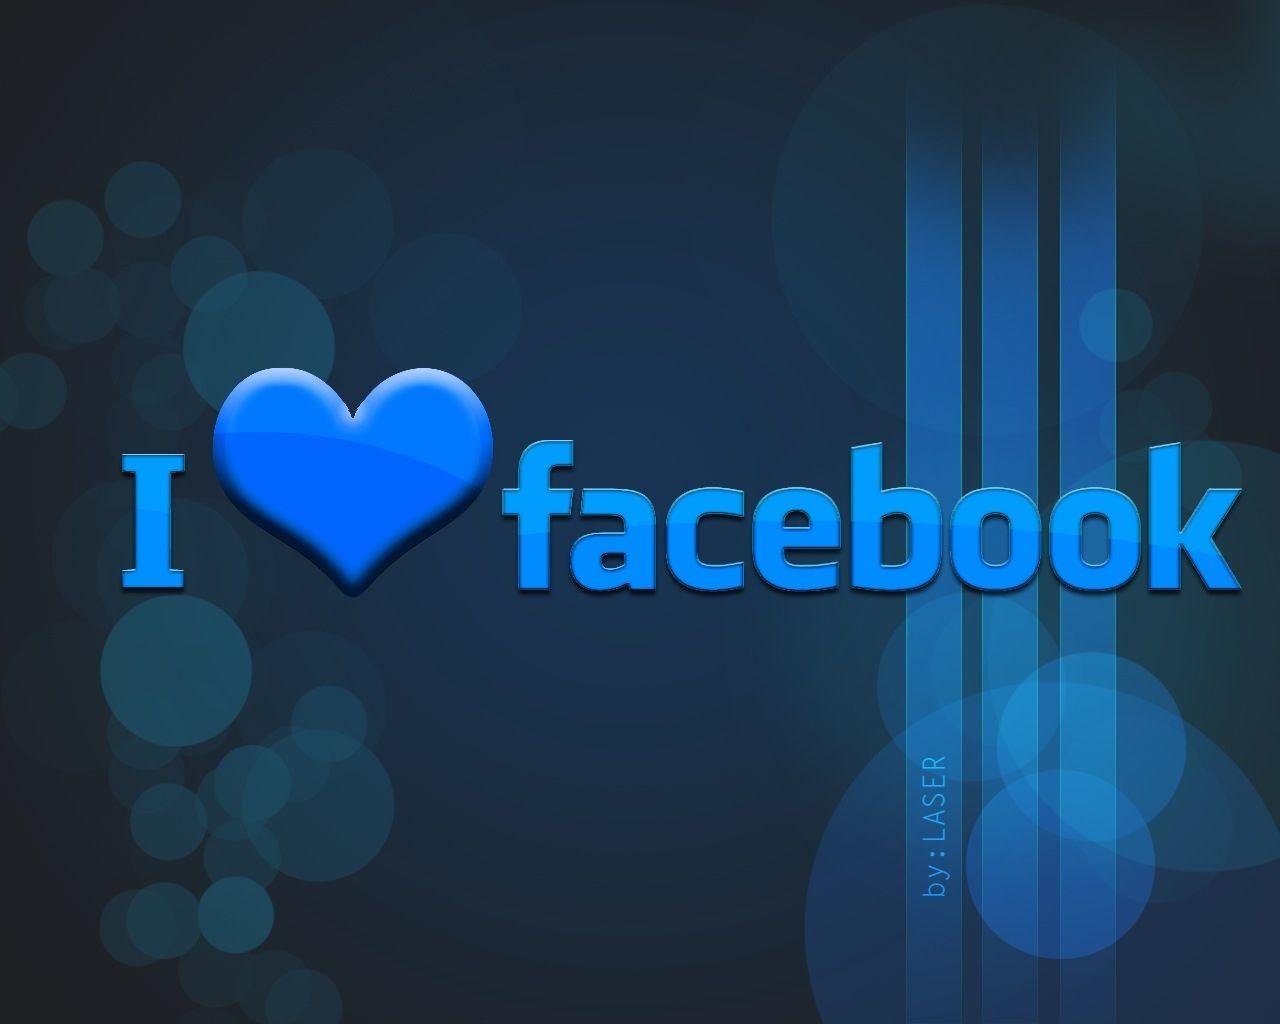 Hd wallpaper upload - New Cool Wallpaper To Upload On Facebook Download Cool Wallpaper To Upload On Facebook Hd